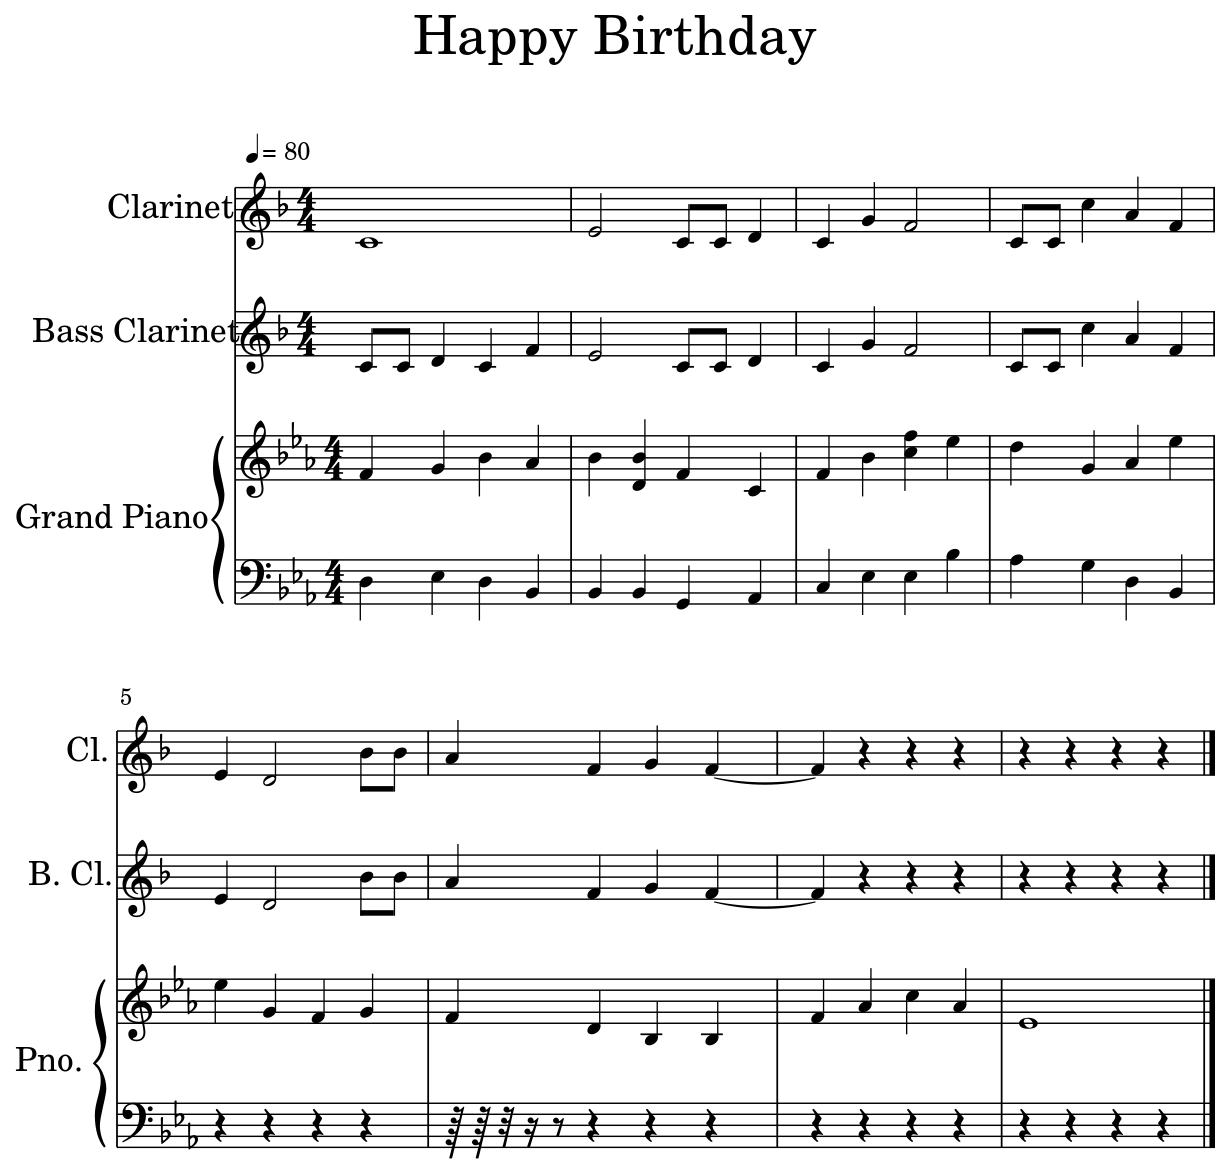 Sheet Music For Clarinet, Bass Clarinet